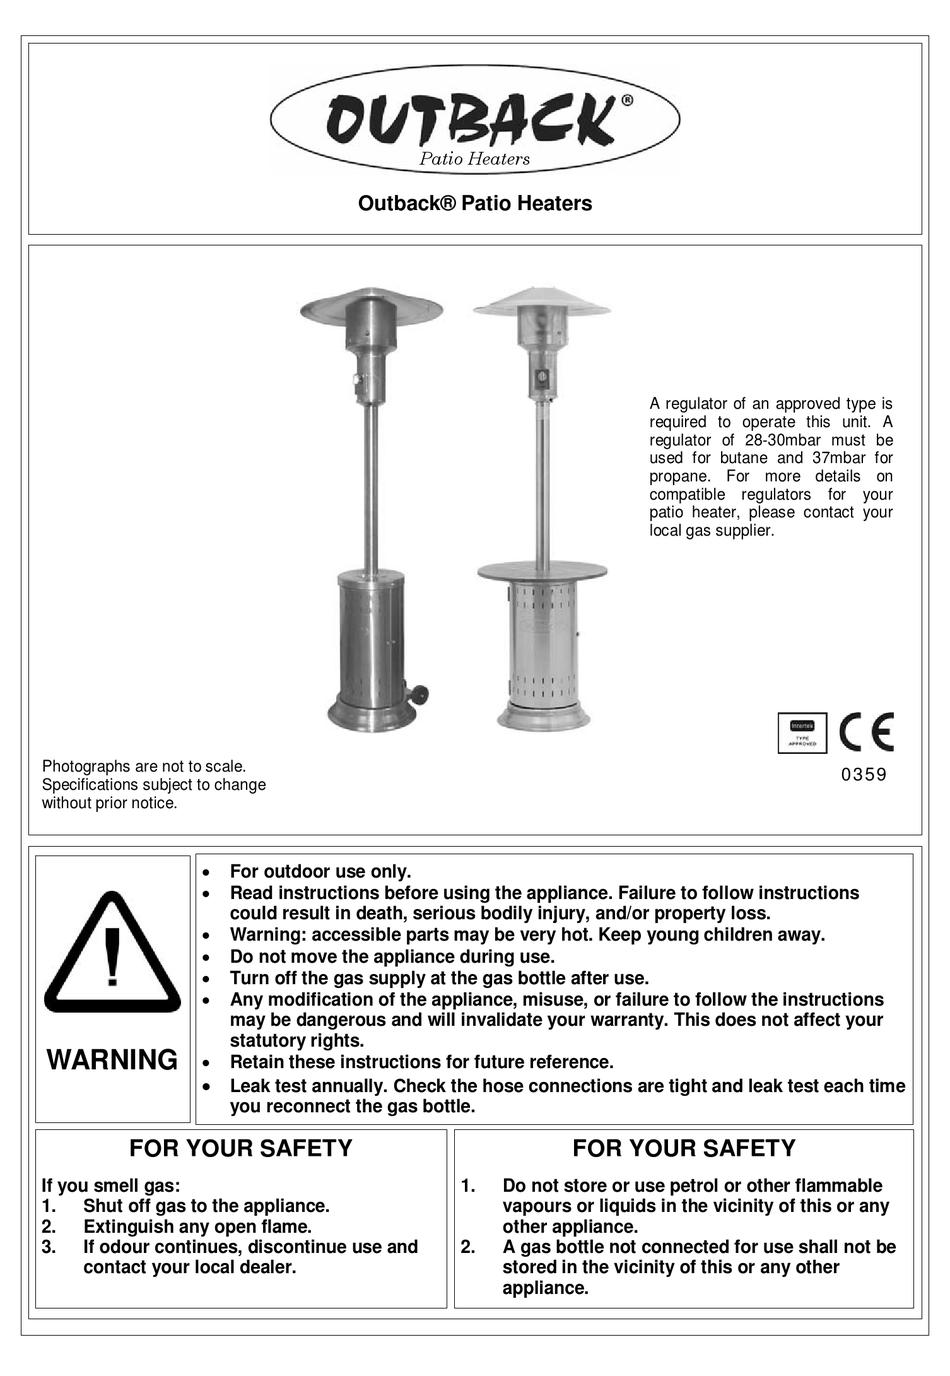 outback ph04 manual pdf download